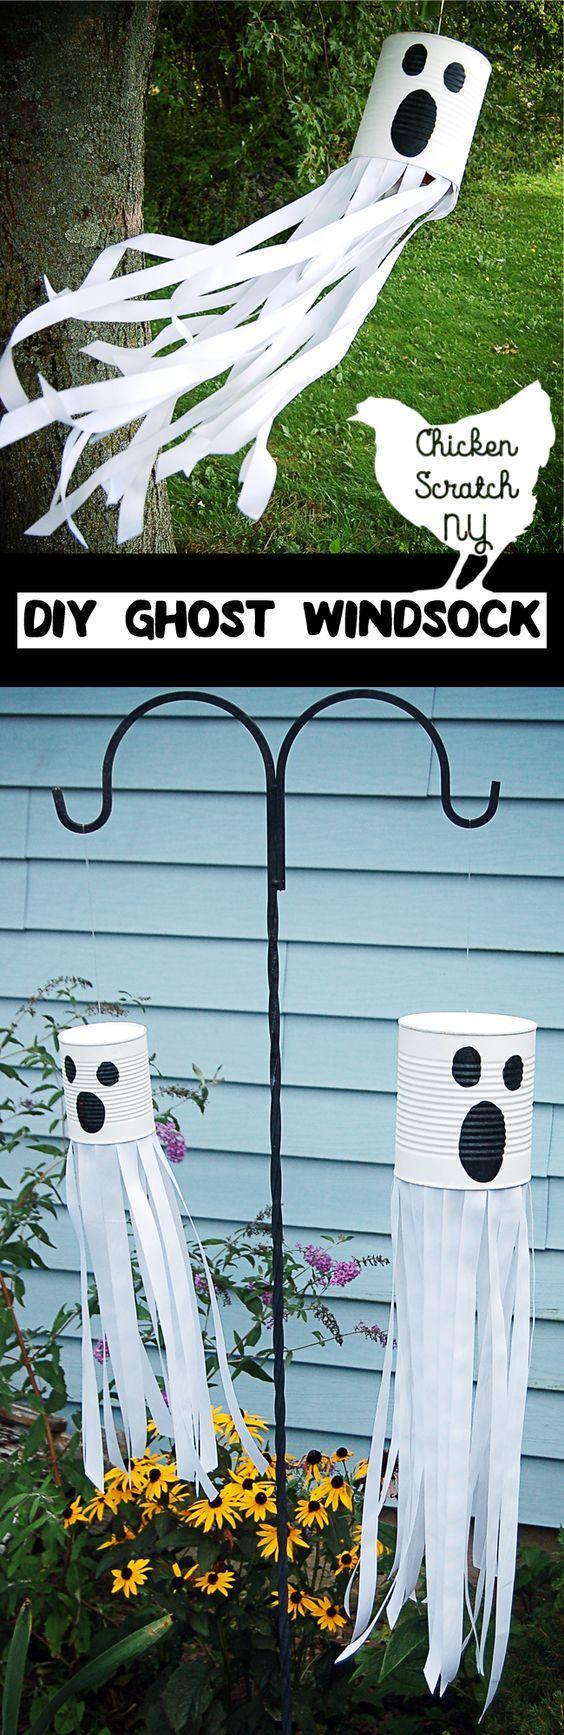 15 Halloween Bastelideen + Anleitungen - Windsack-Gespenst